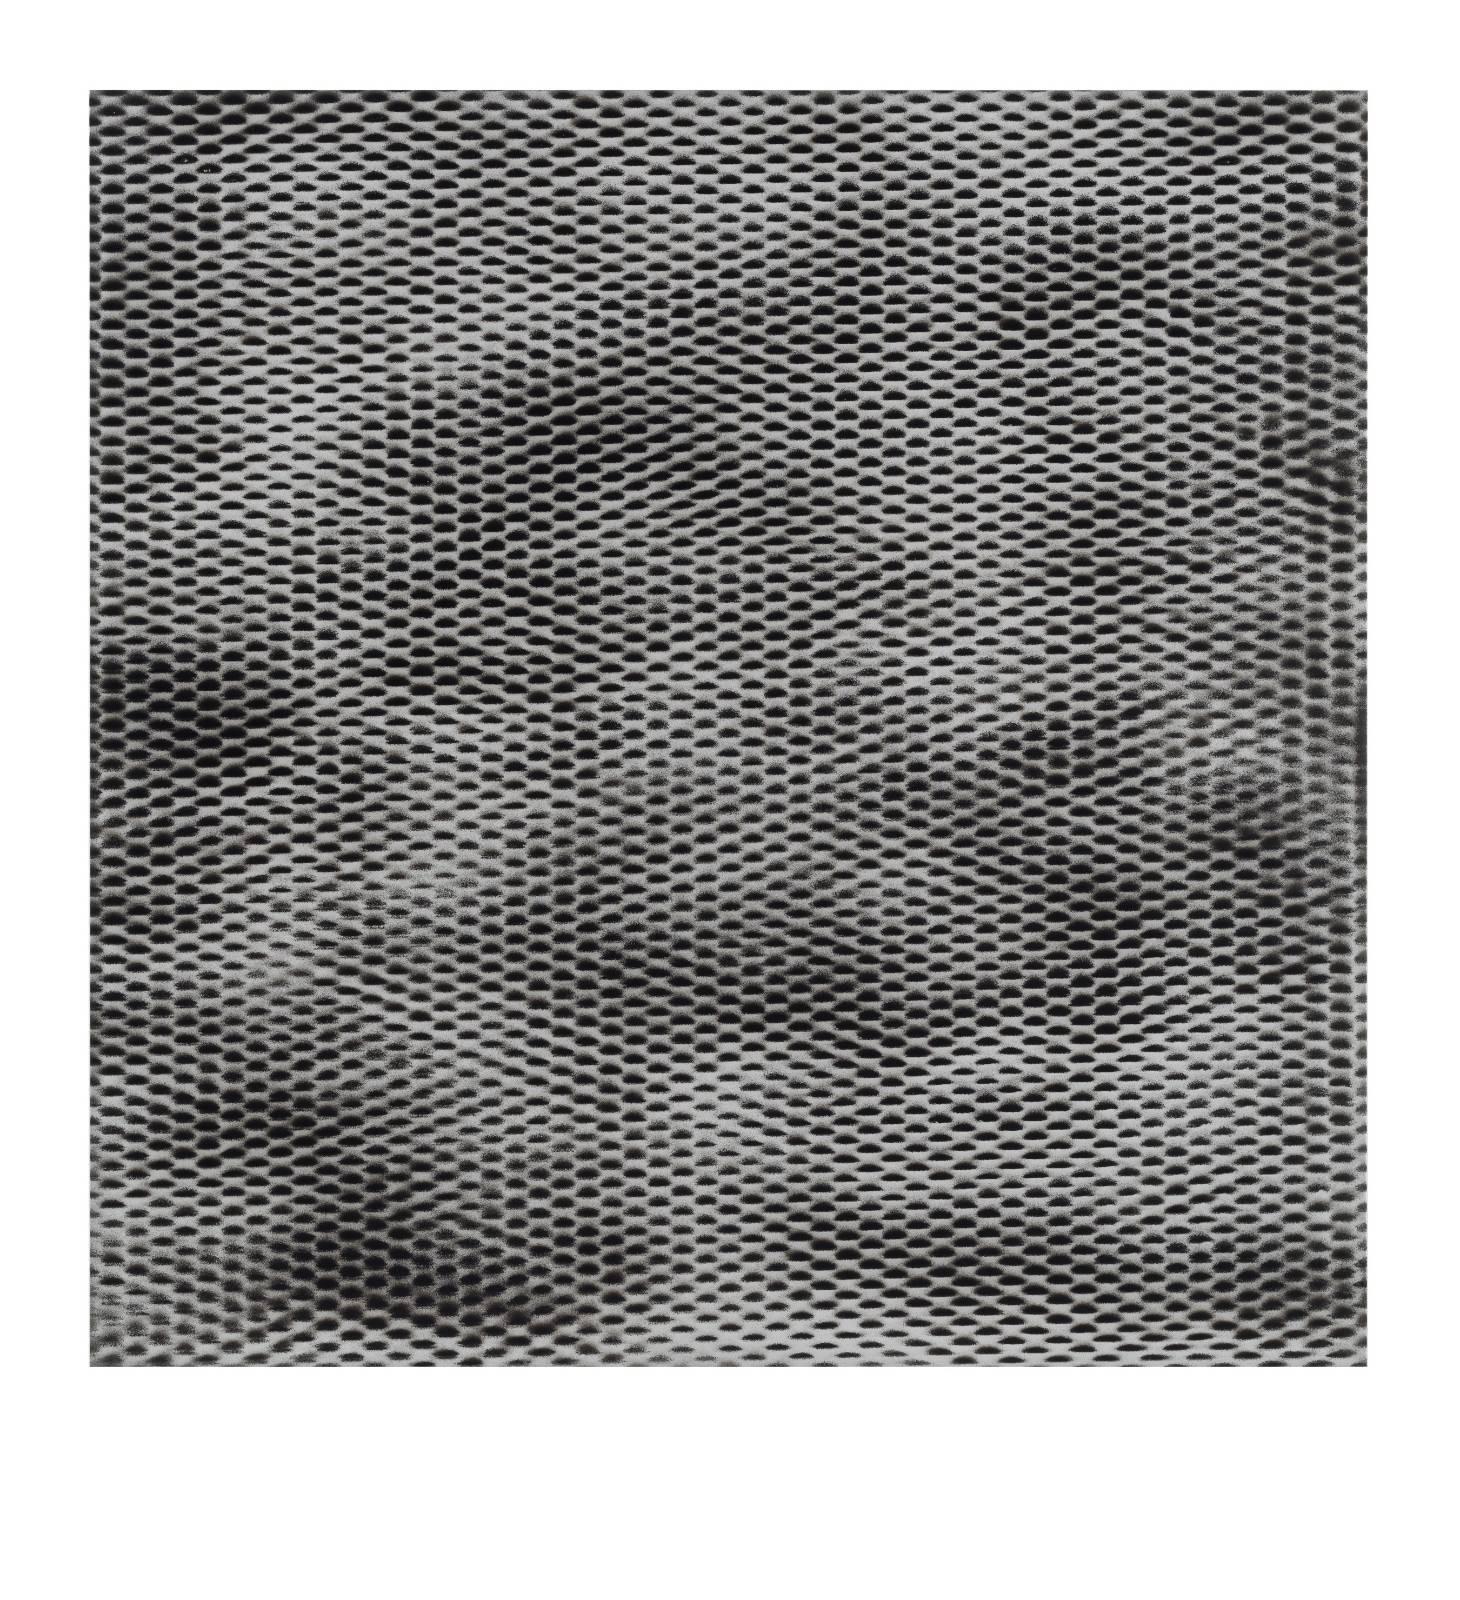 "STAIN 55°36'56.3""N 13°01'17.5""E, 2016, spraypaint on aluminium, 81,3 x 81,3 cm"